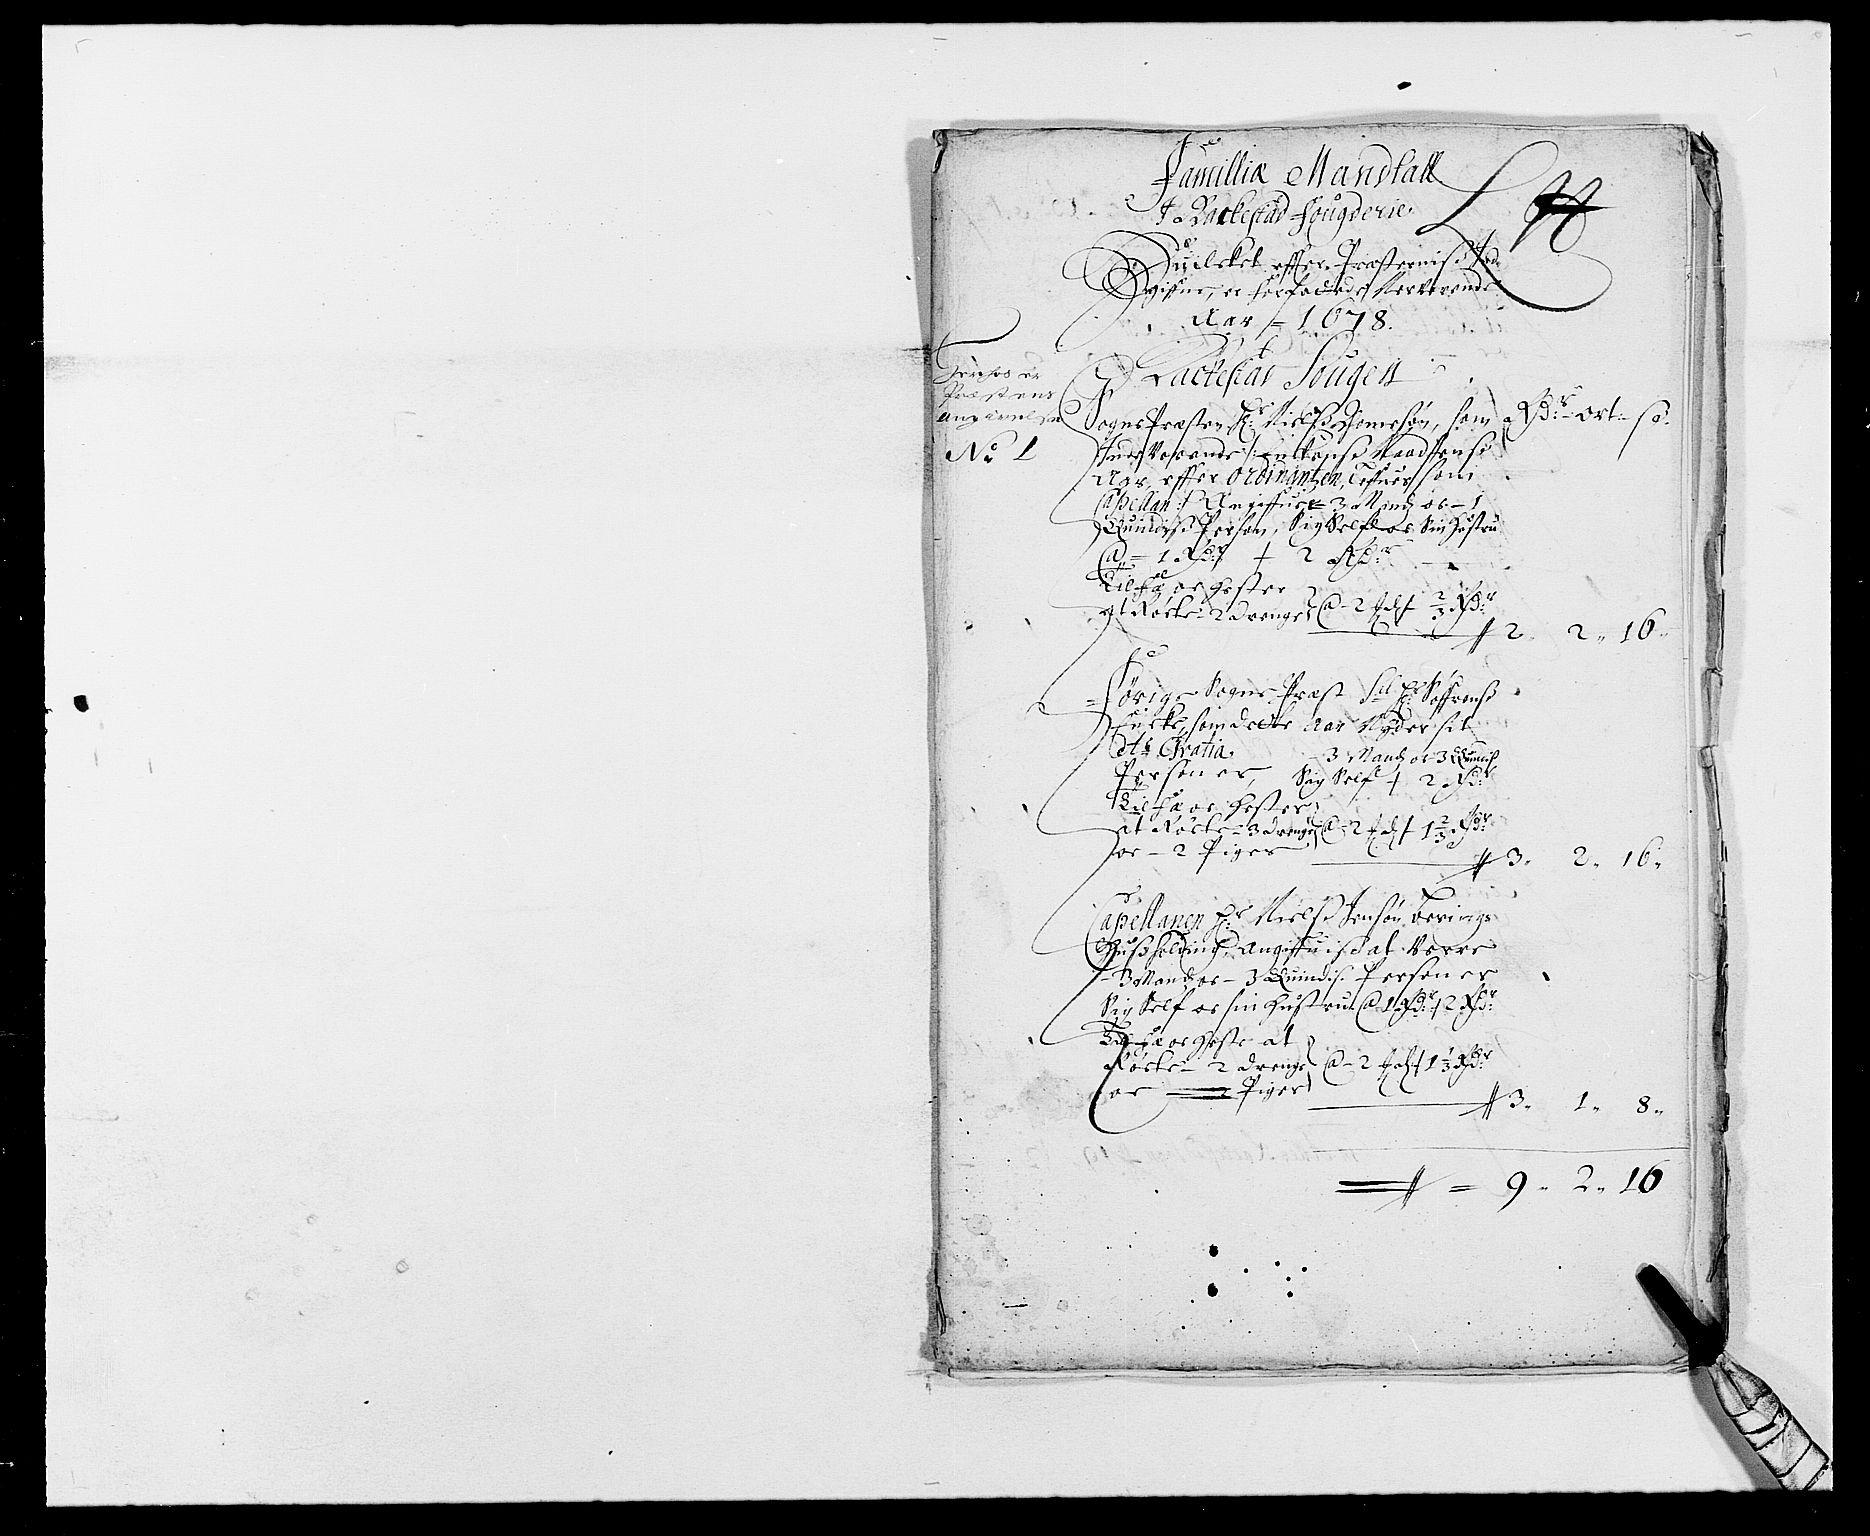 RA, Rentekammeret inntil 1814, Reviderte regnskaper, Fogderegnskap, R05/L0271: Fogderegnskap Rakkestad, 1678-1679, s. 199